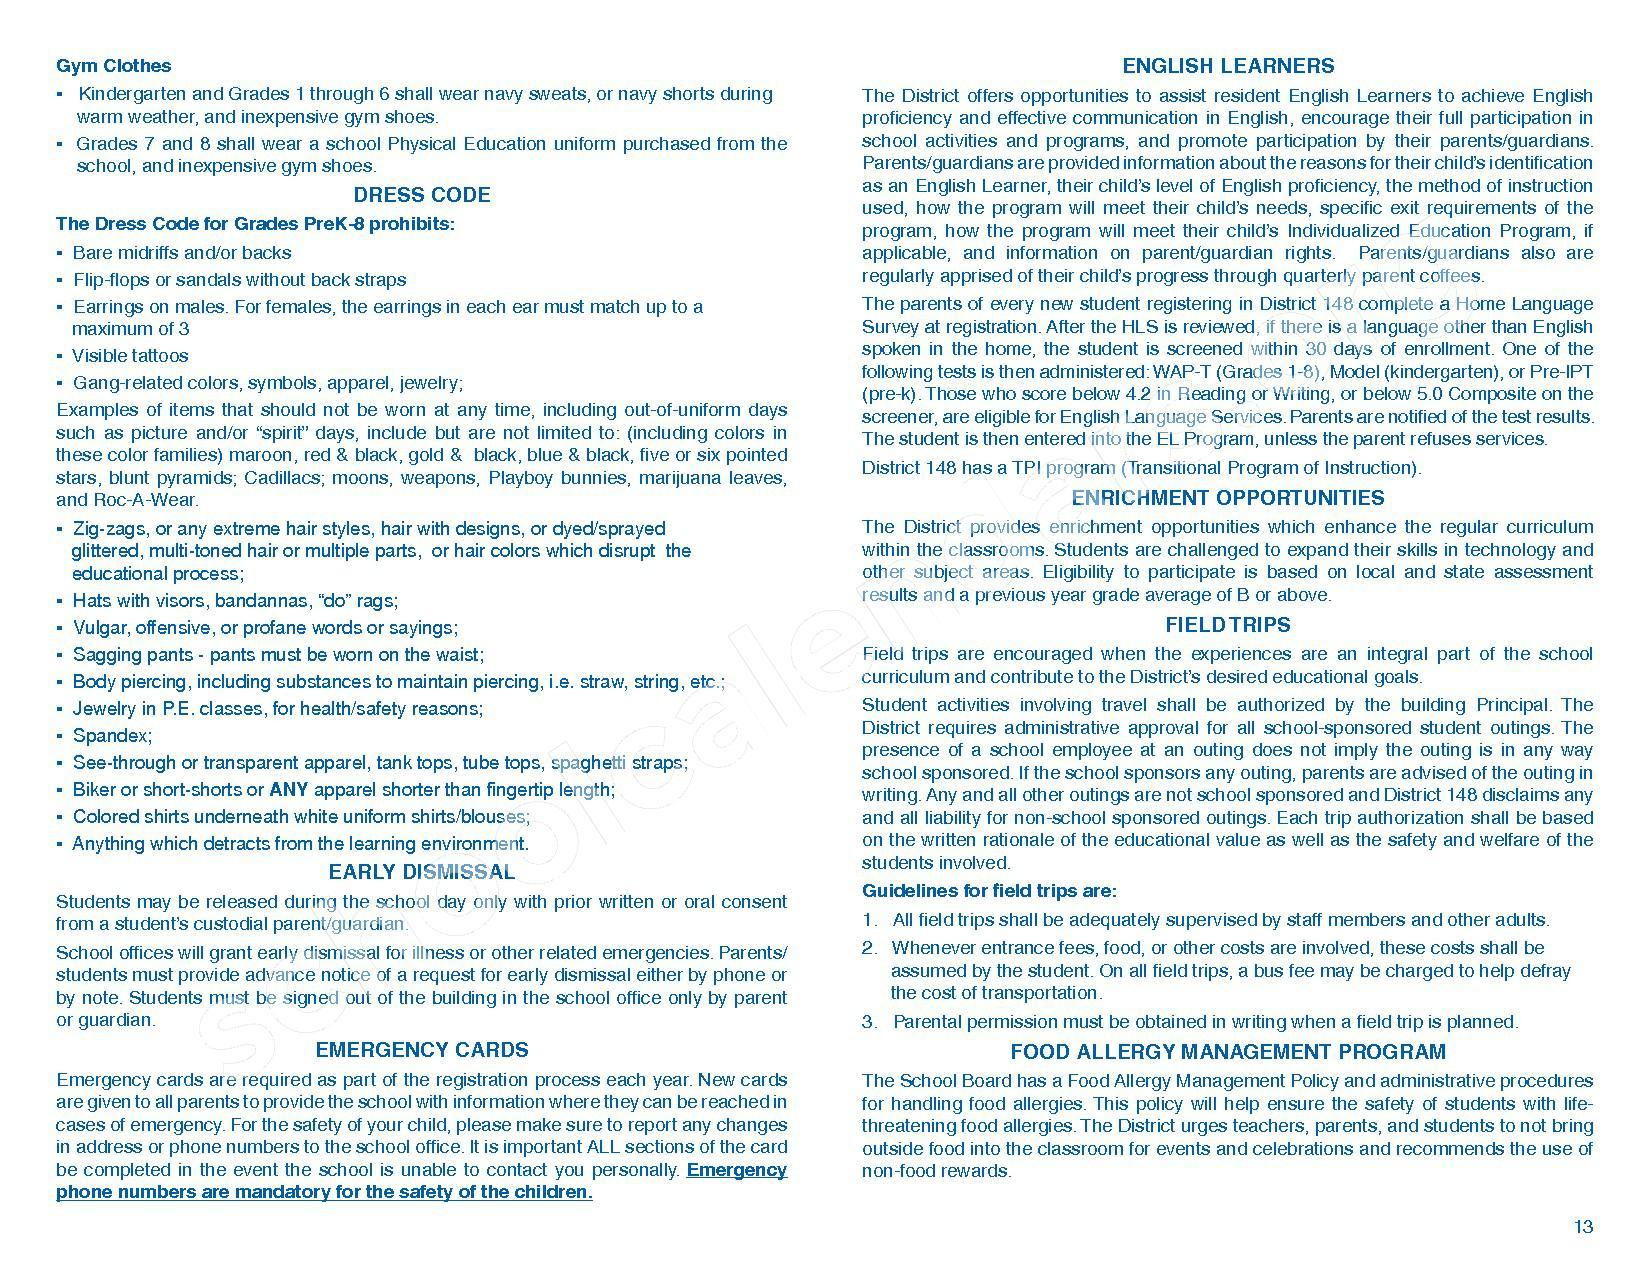 2016 - 2017 Parent/Student Handbook – Roosevelt Elementary School – page 17